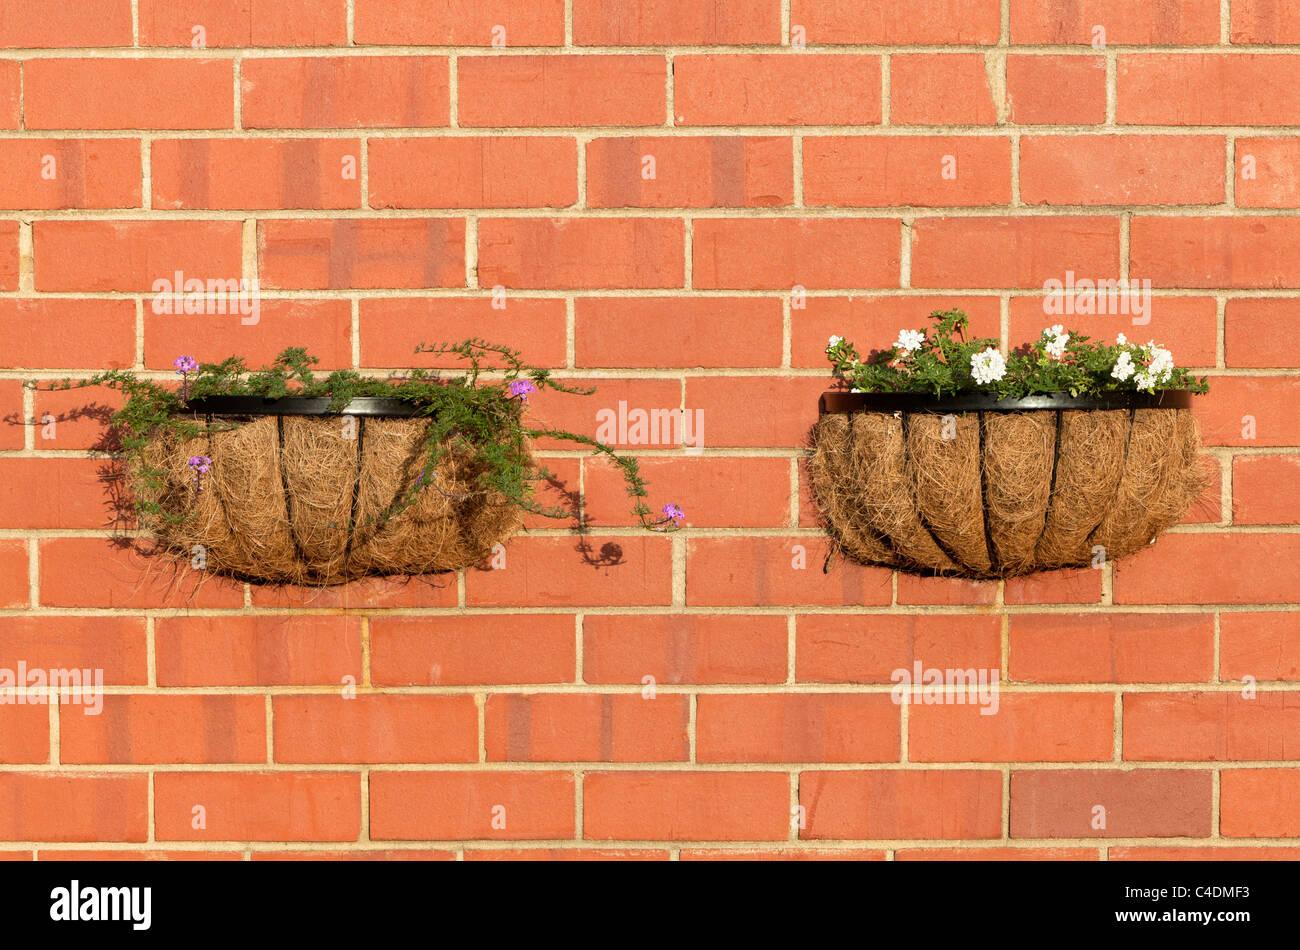 Verbena flores que crecen en cestas de pared Imagen De Stock